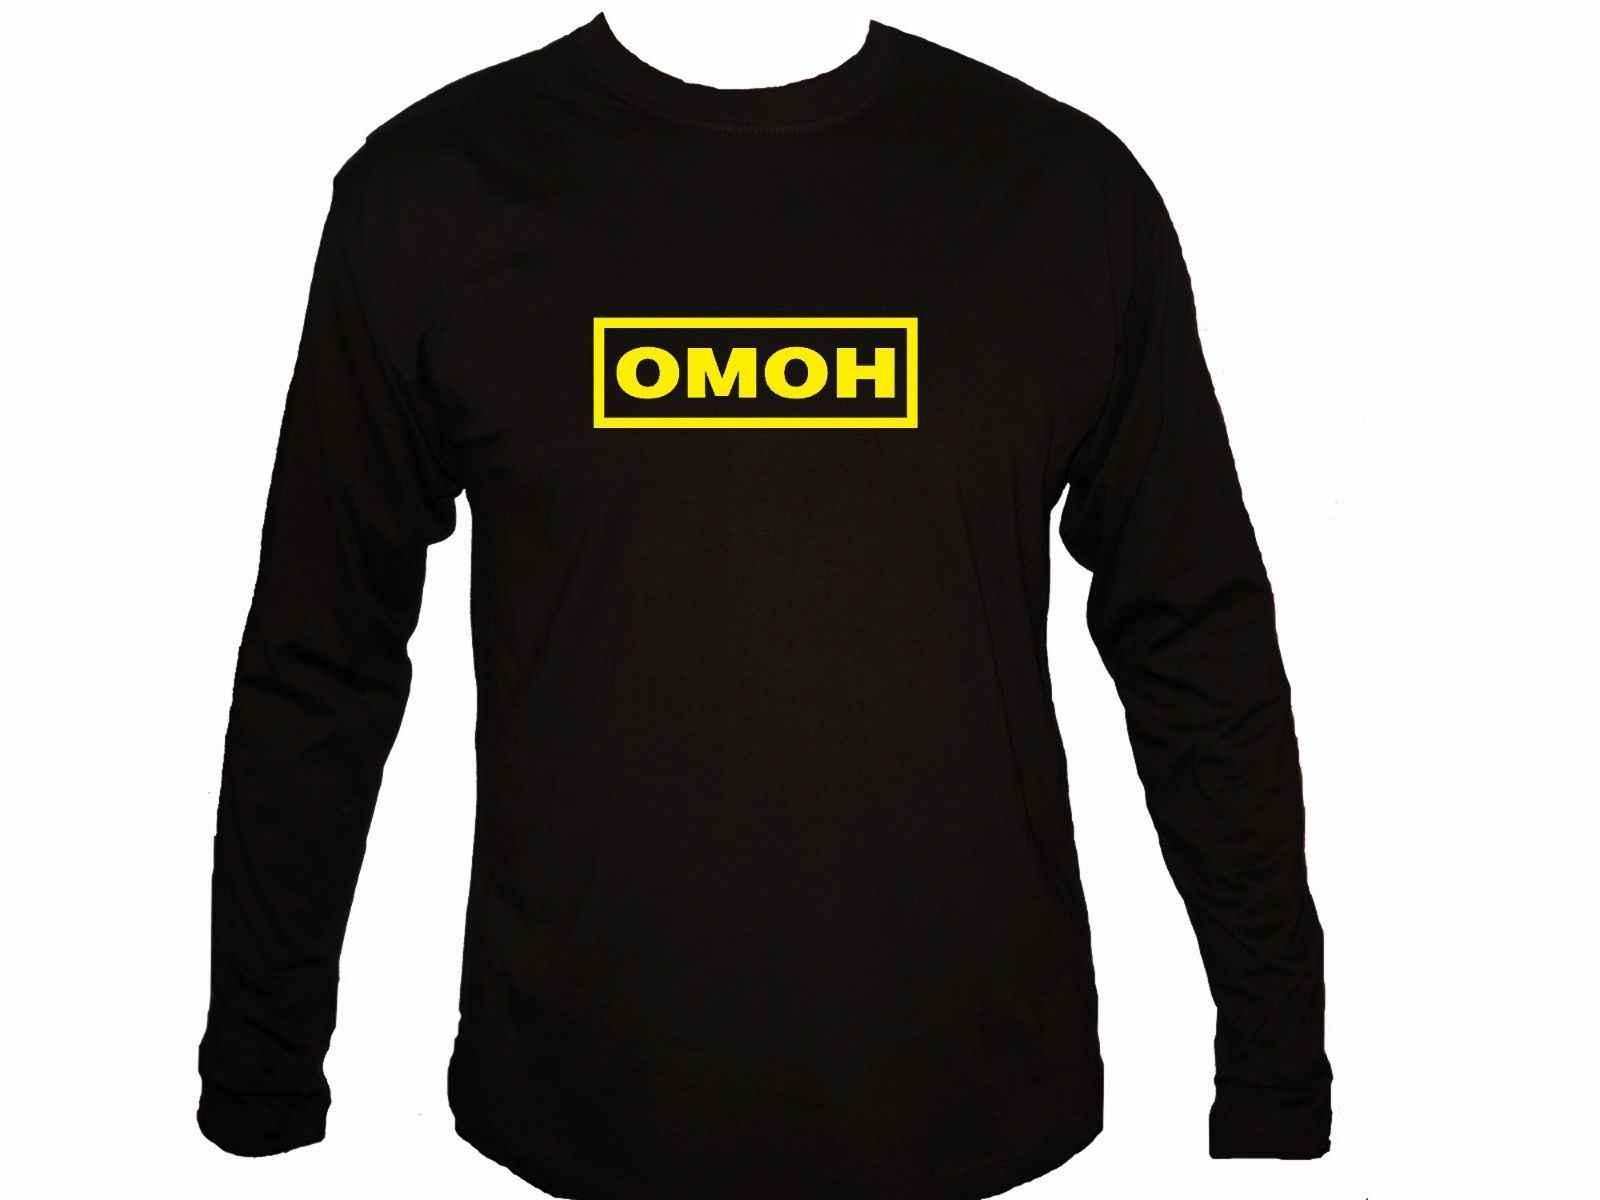 Camiseta de manga larga informal con mangas Omon SWAT especial CCCR URSS ruso CCCP